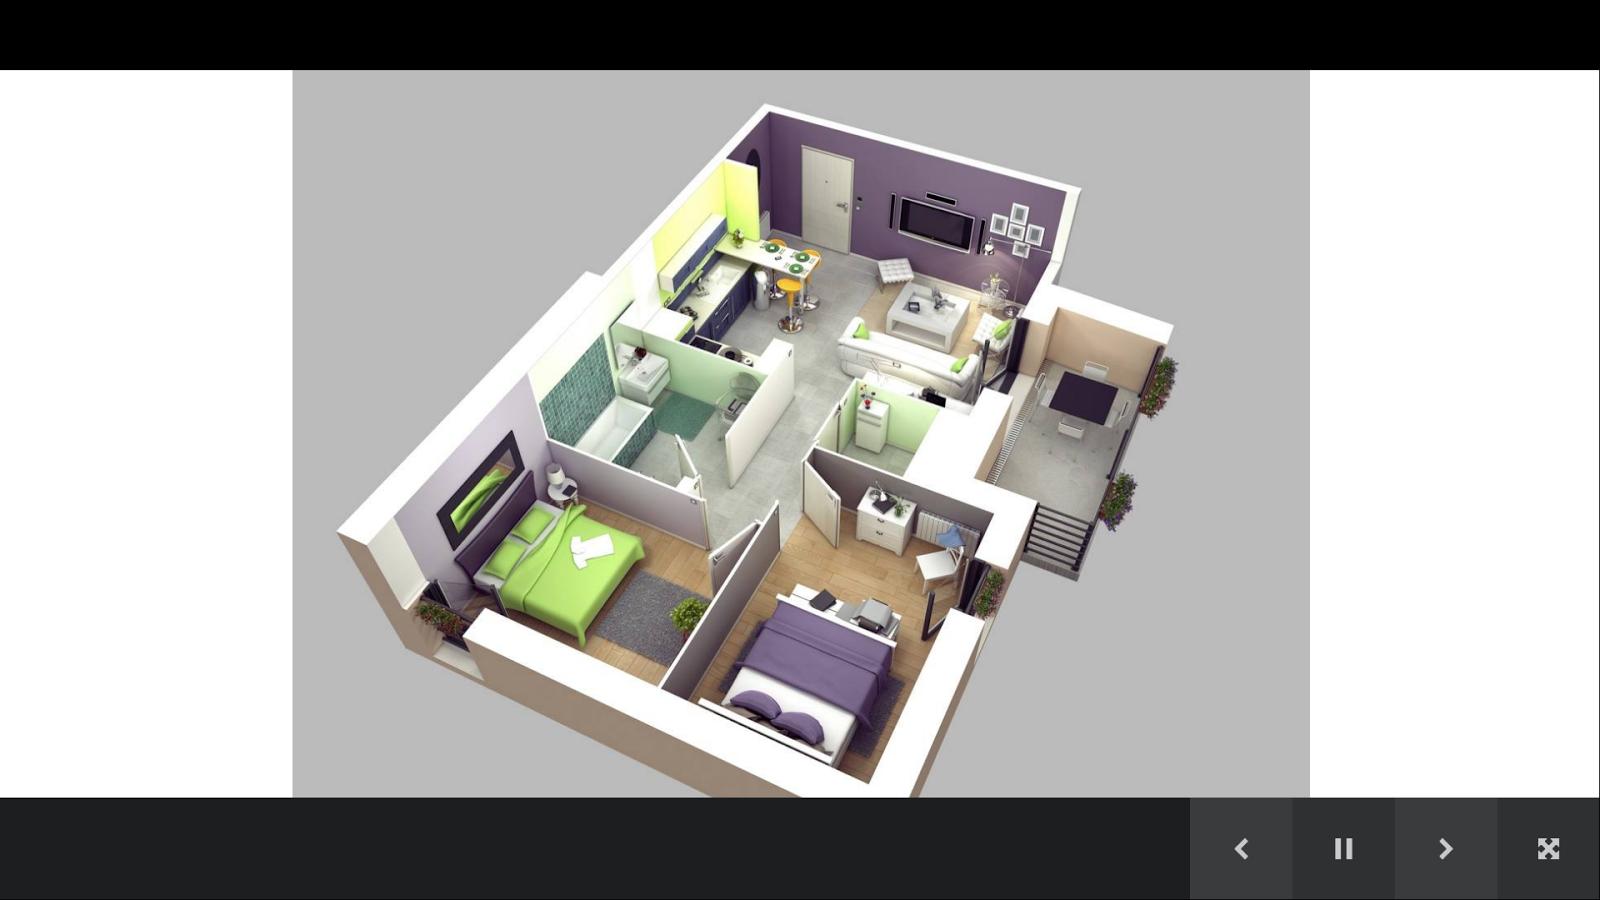 77+ Planner 5d Home Design Apk Data - Home Design With Plan Planner ...